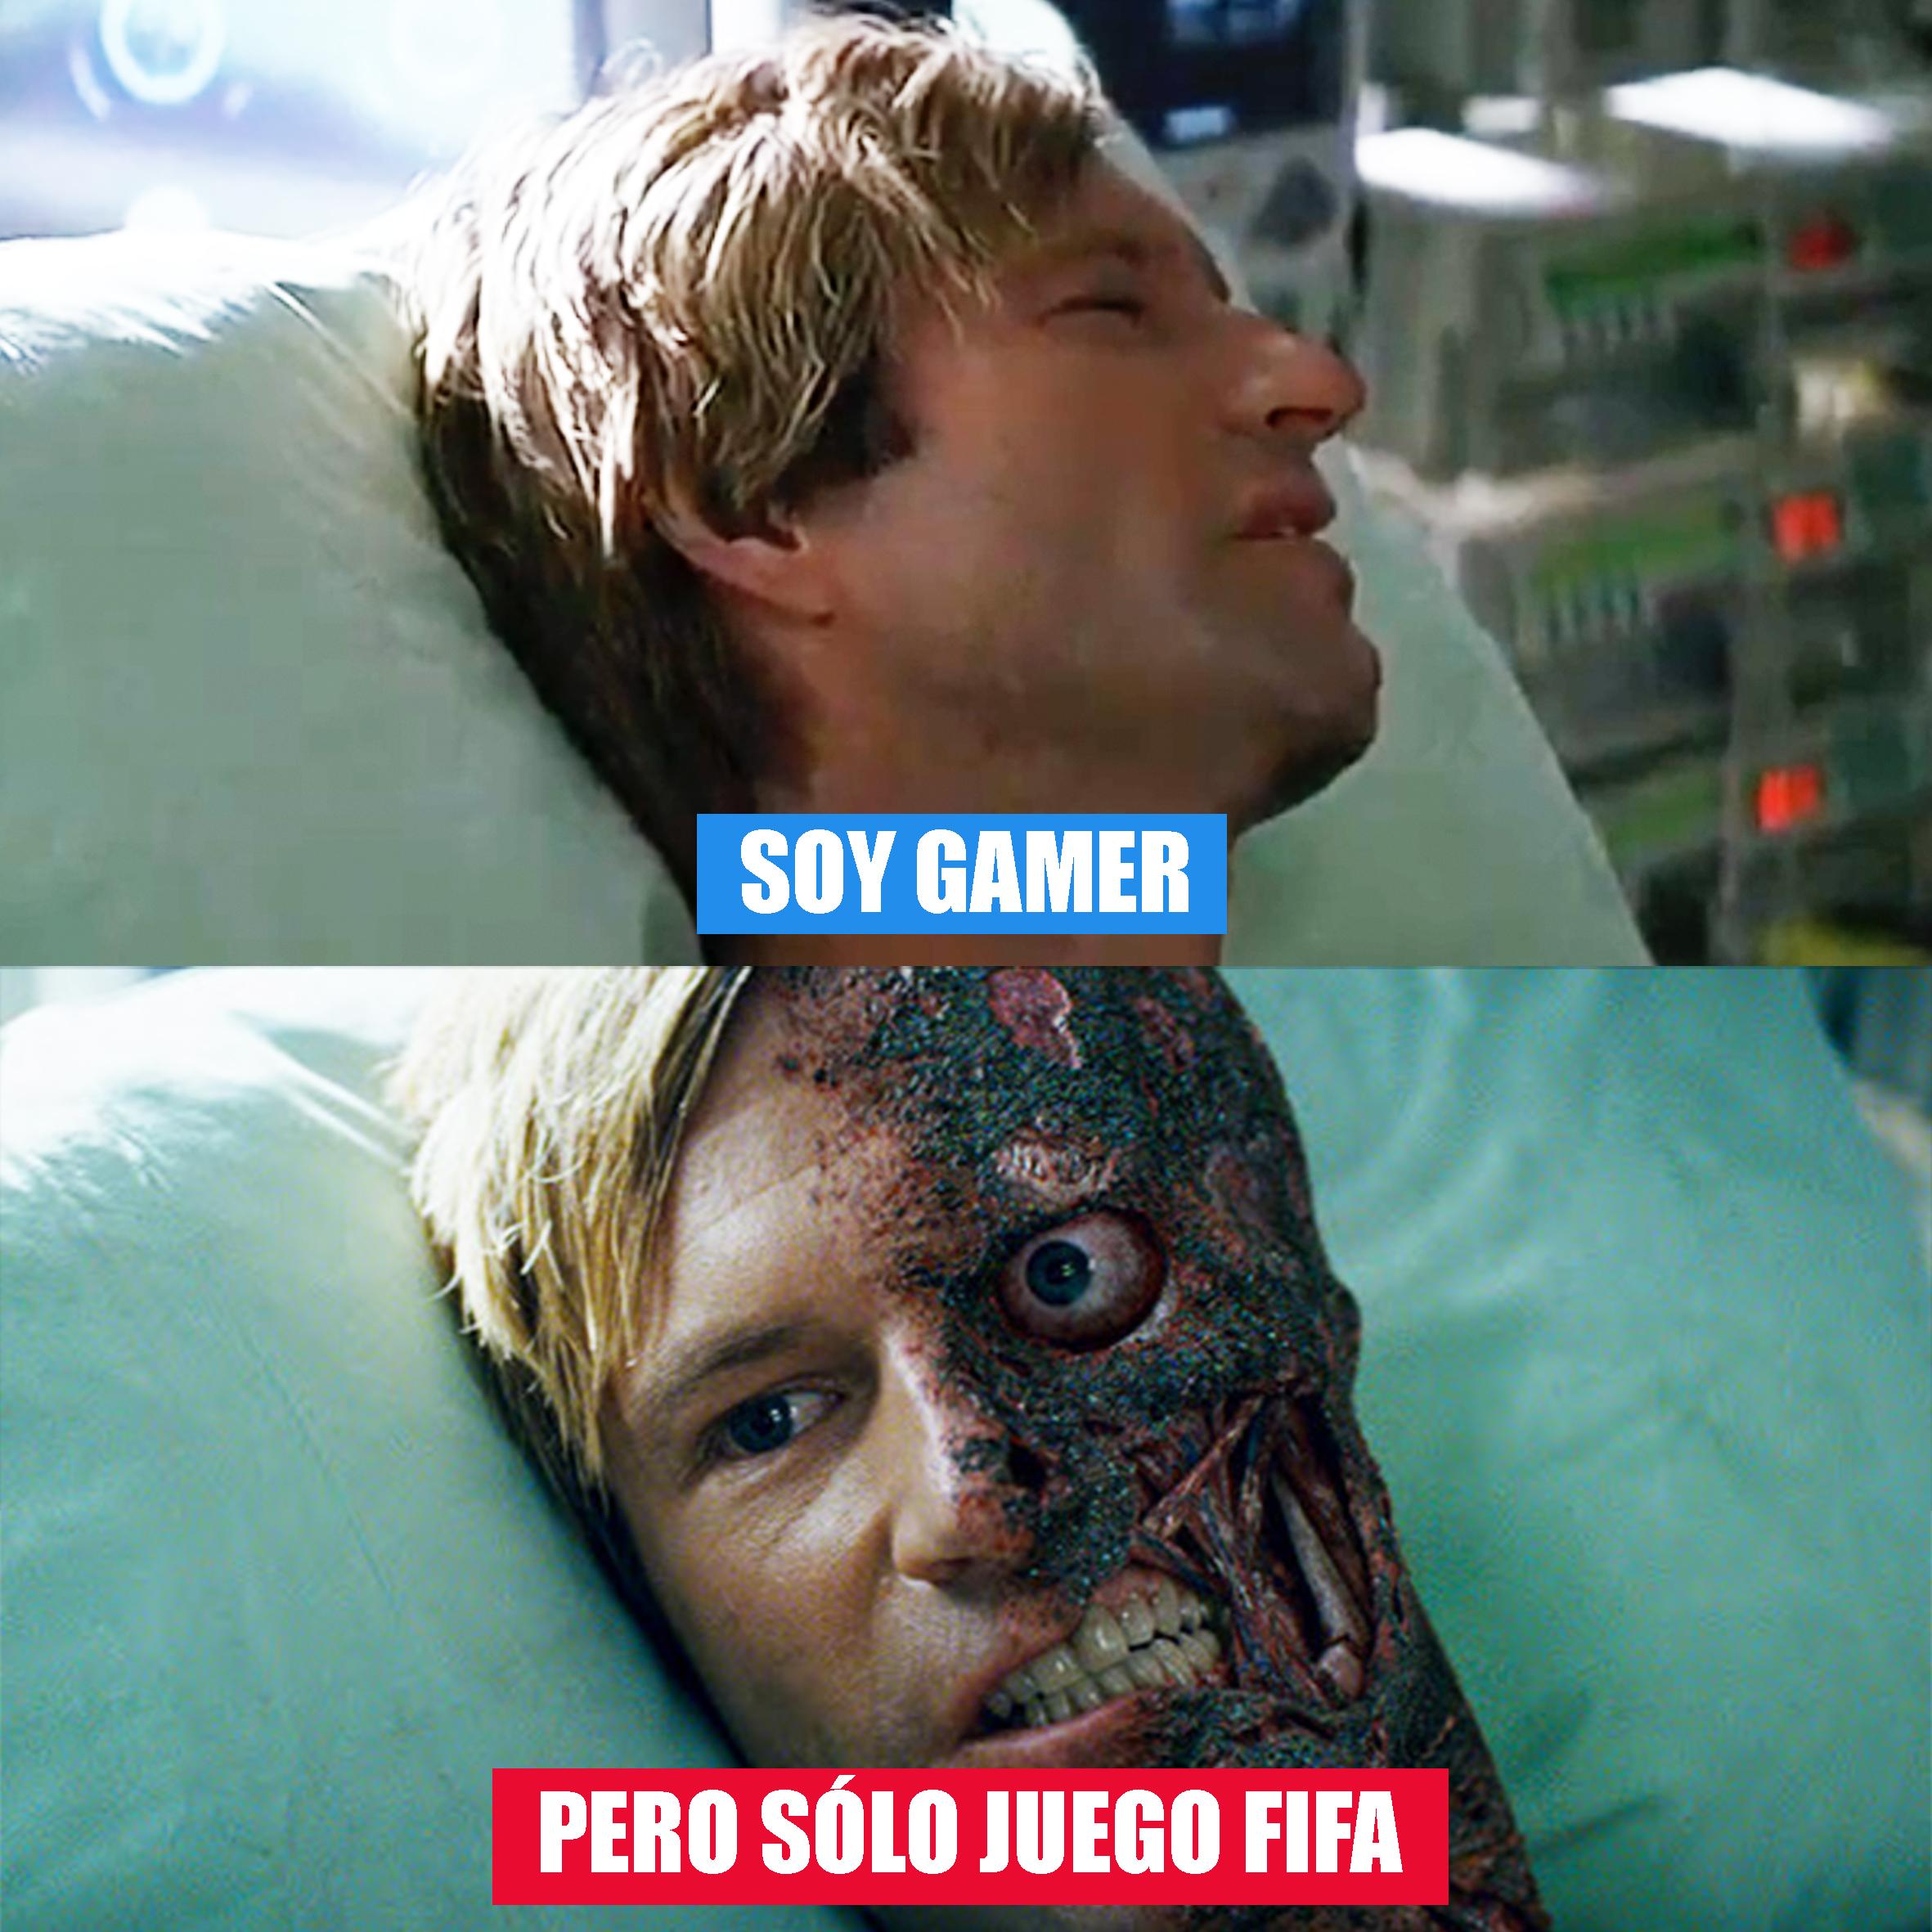 Verdades FIFA Dent Meme